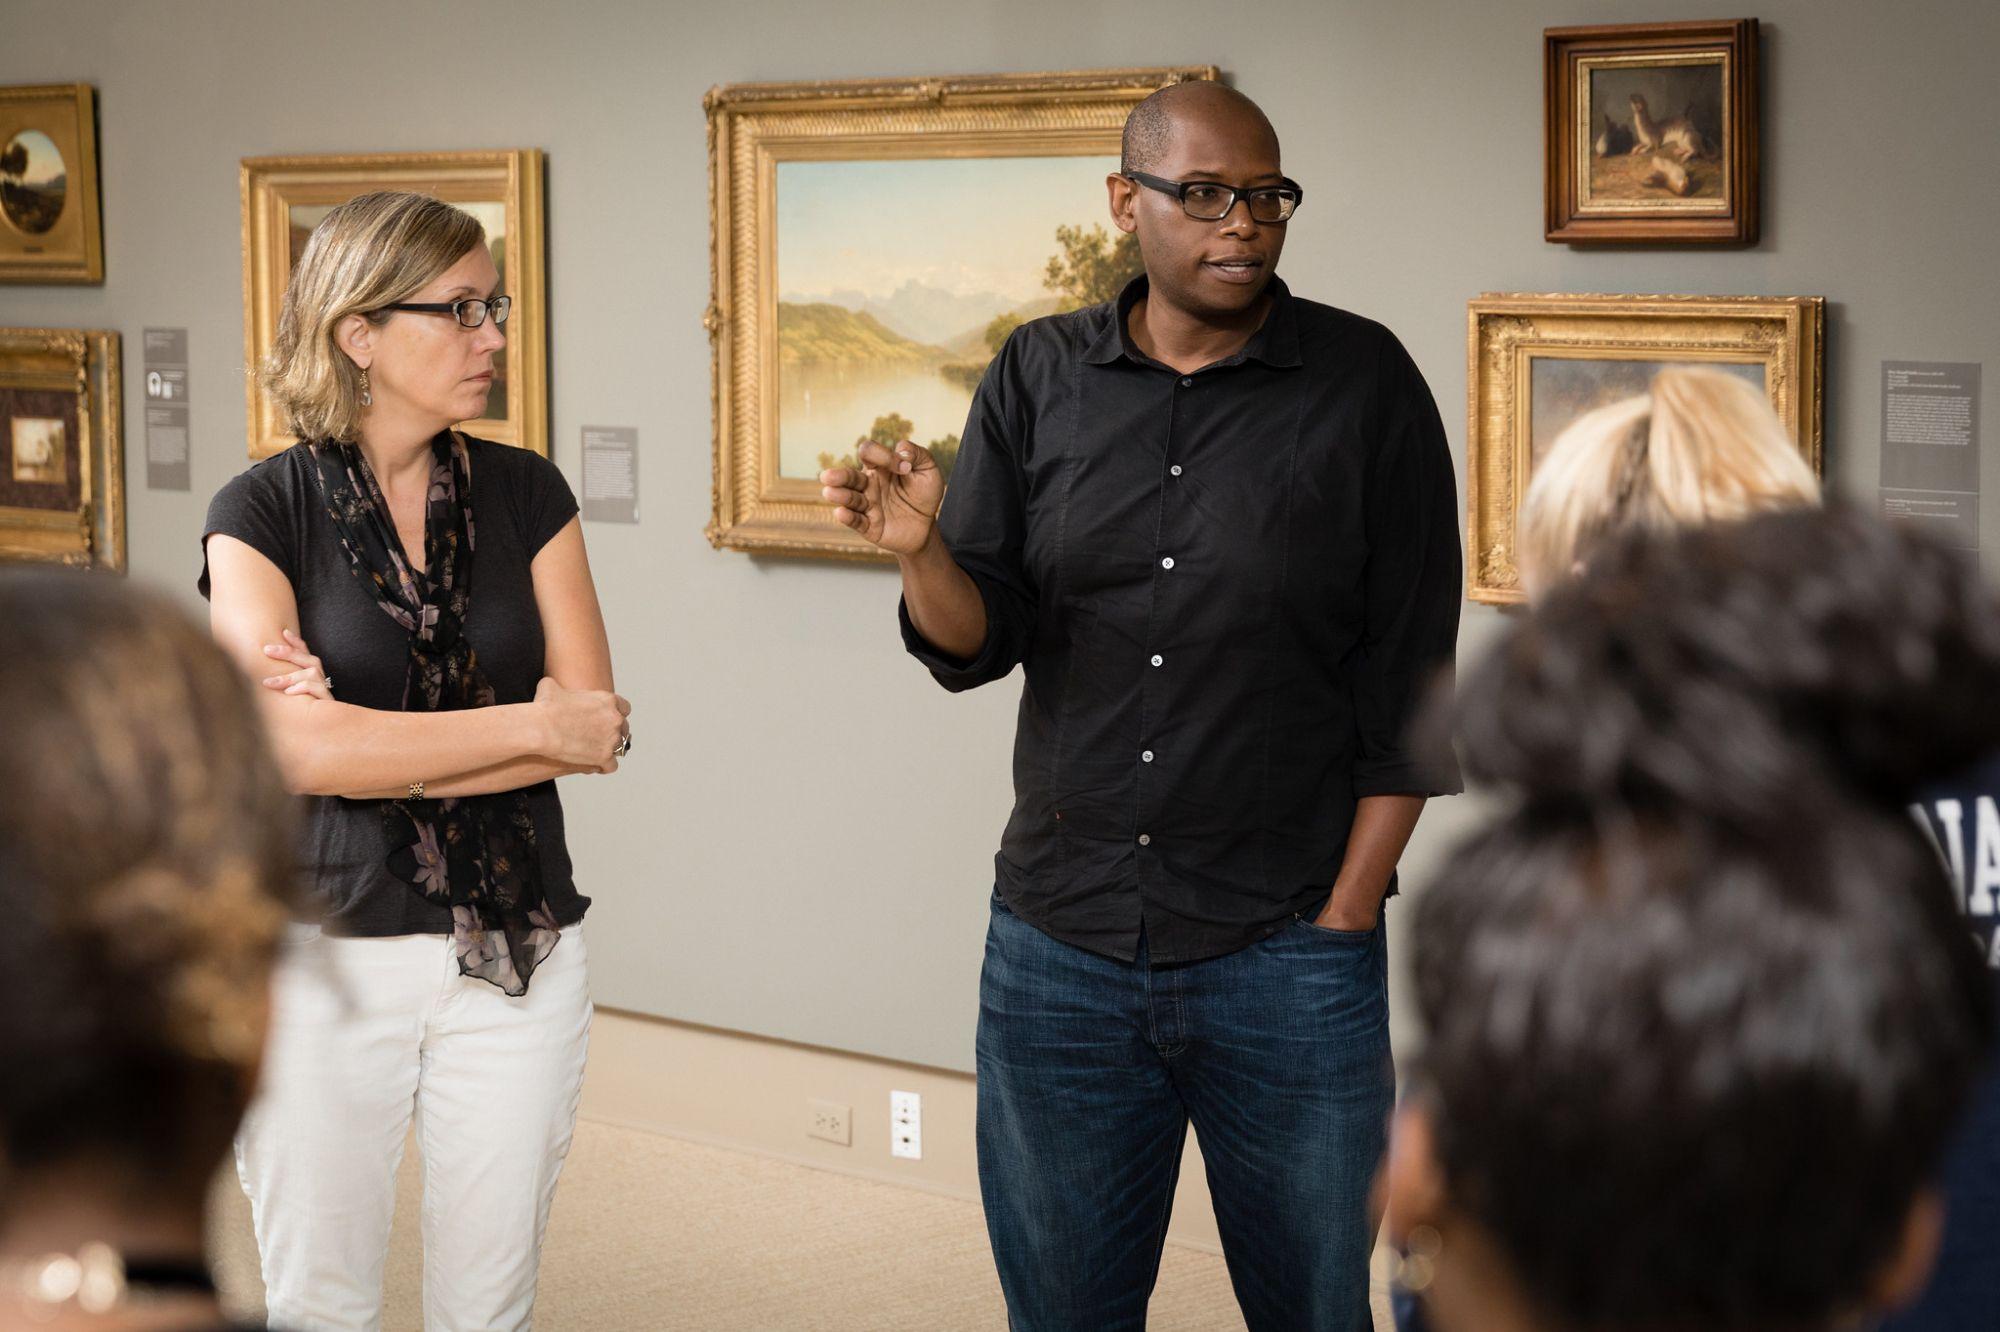 History professor Julian Chambliss and Ena Heller, director of the Cornell Fine Arts Museum.